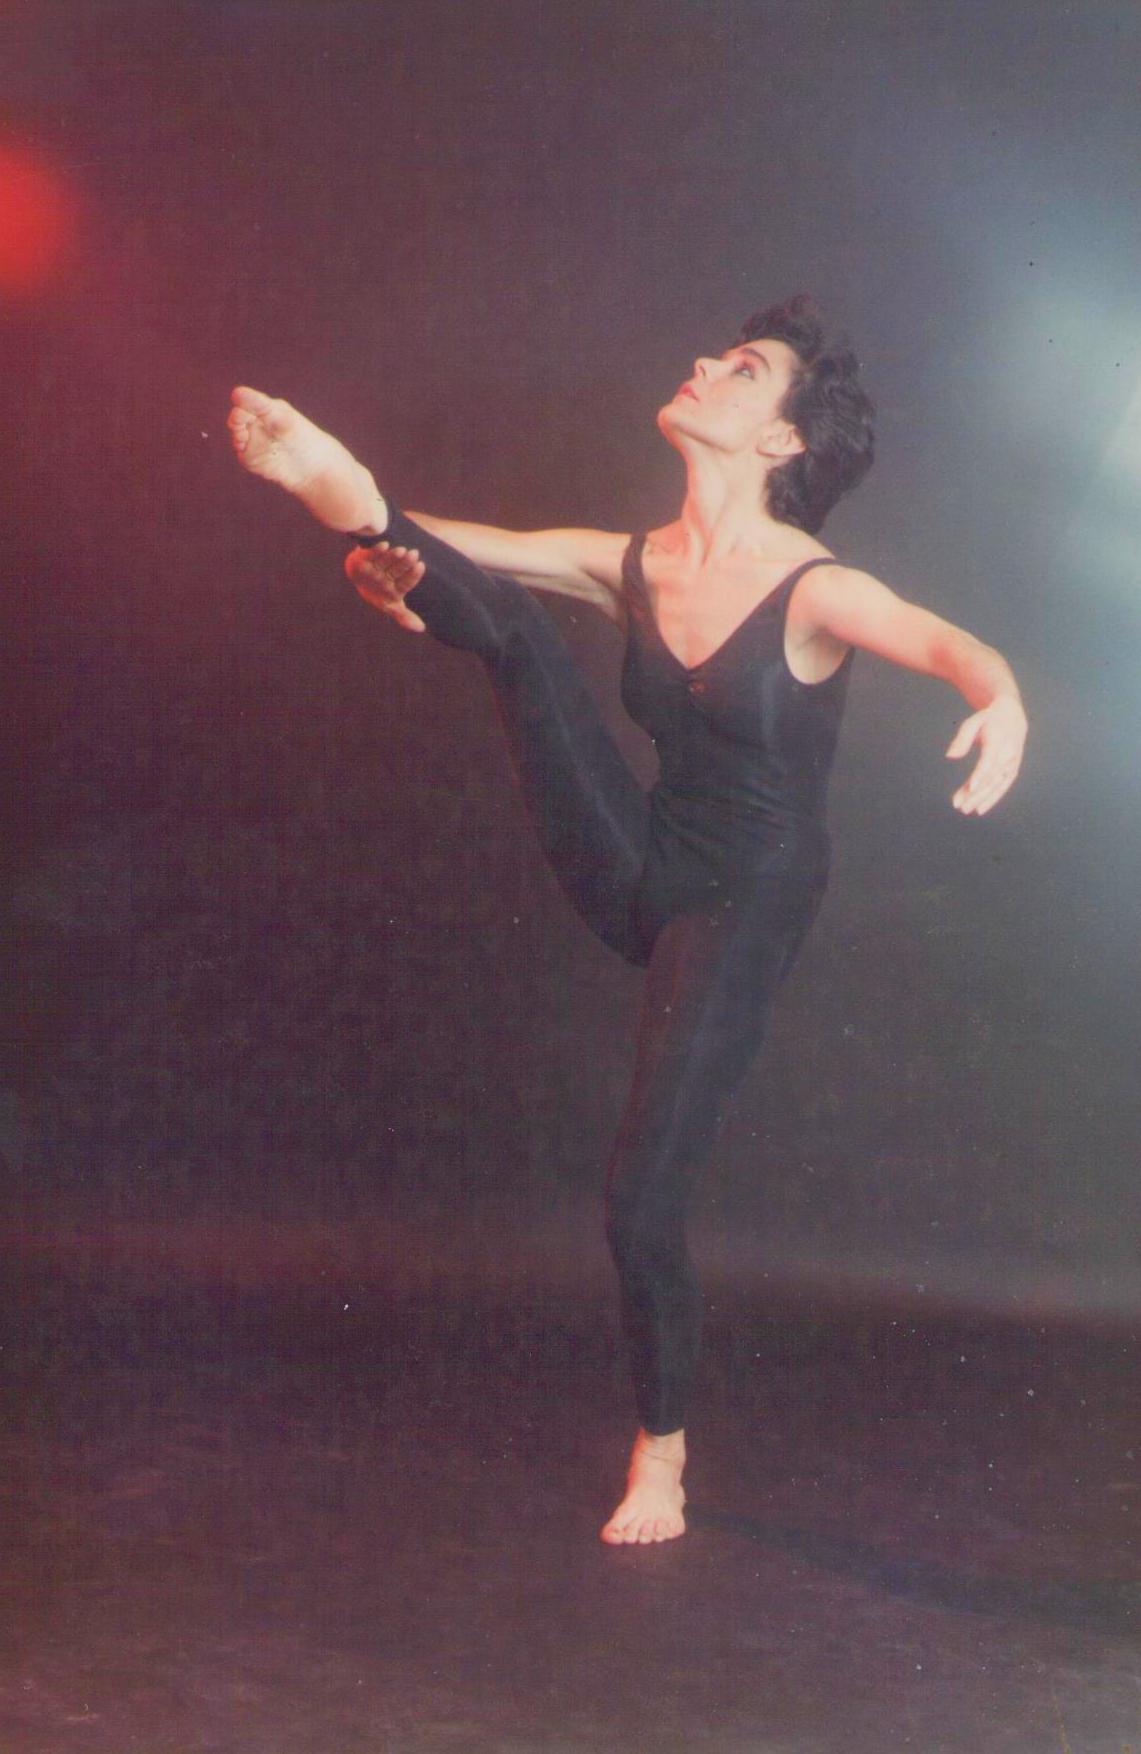 Danza Contemporánea_Belén Martínez